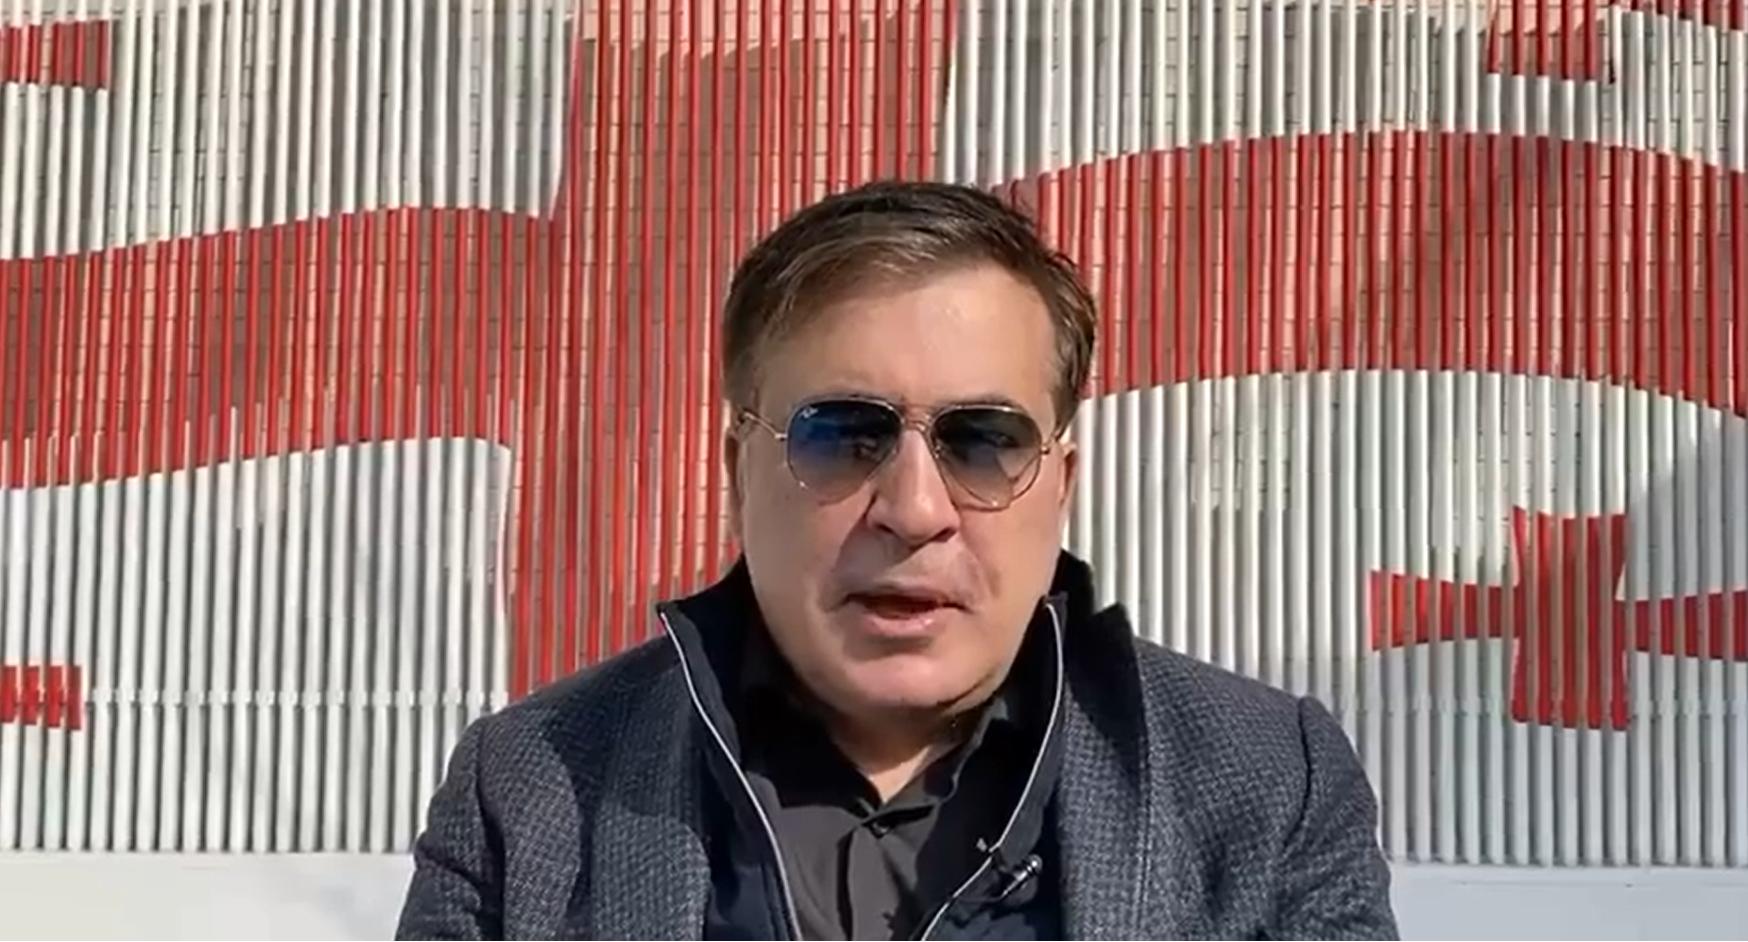 Mikheil Saakashvili 421 #новости возвращение Саакашвили, Гиули Аласания, Михаил Саакашвили